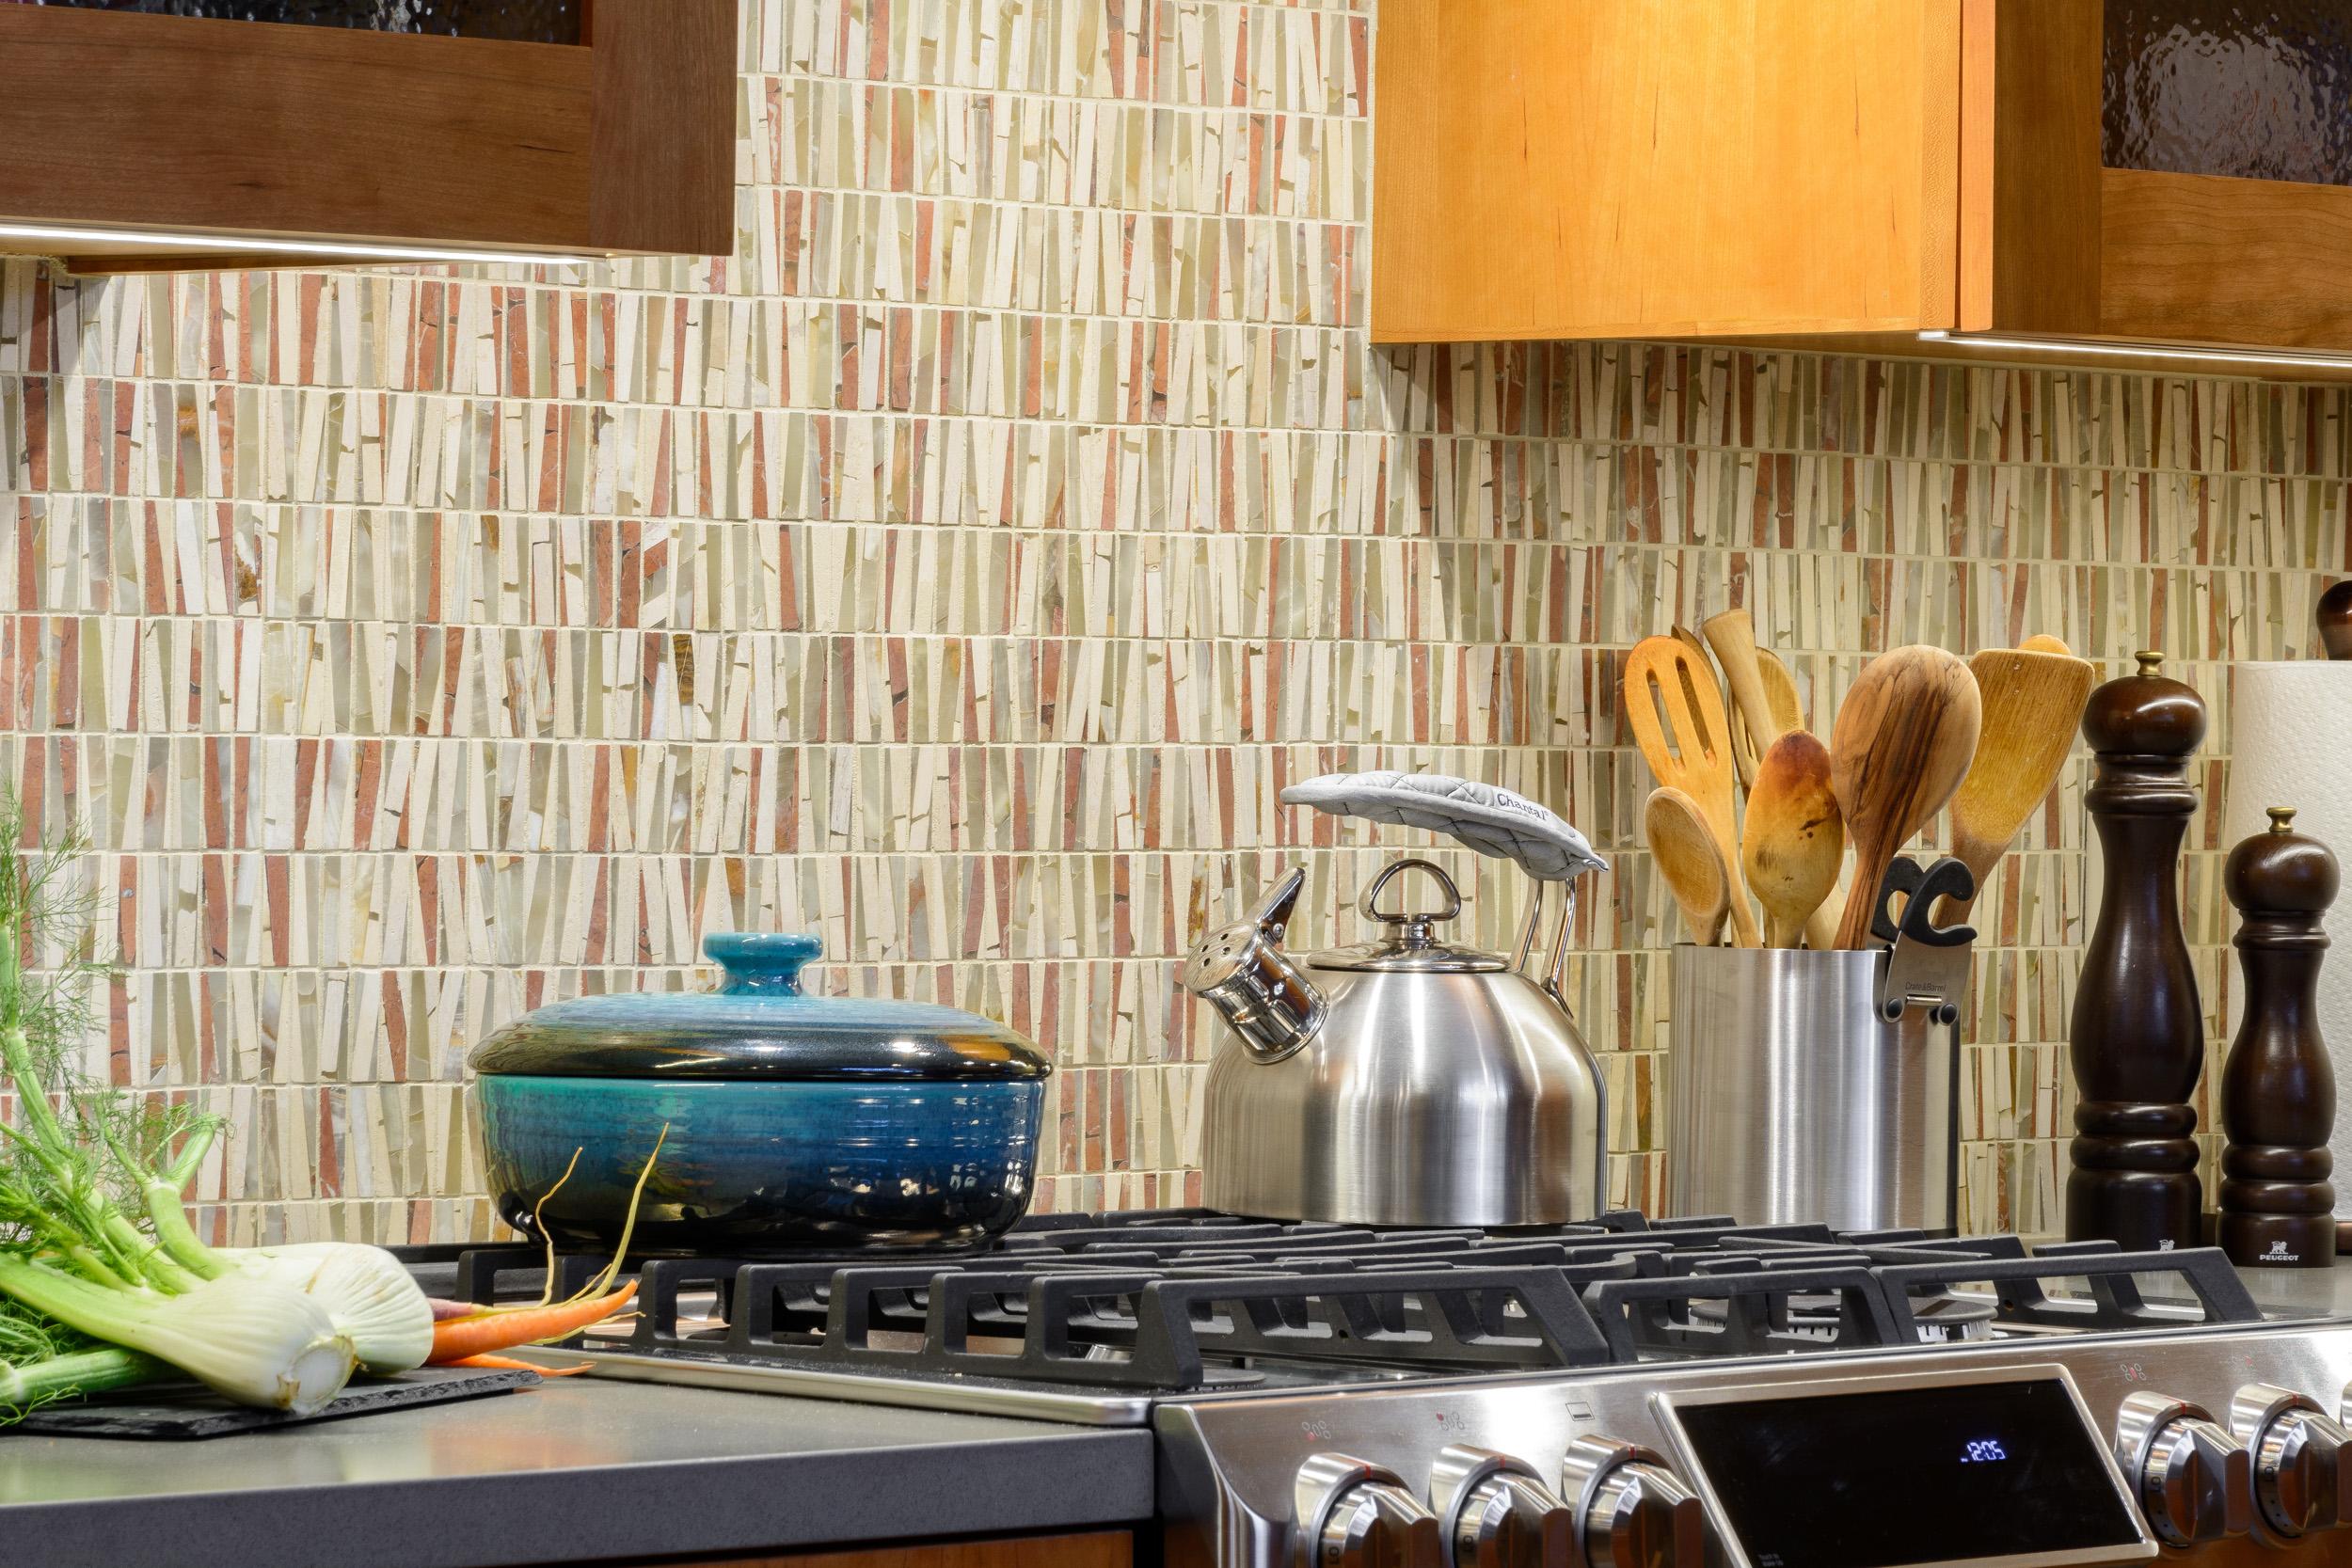 Range, grey quartz countertop and mosaic tile backsplash detail